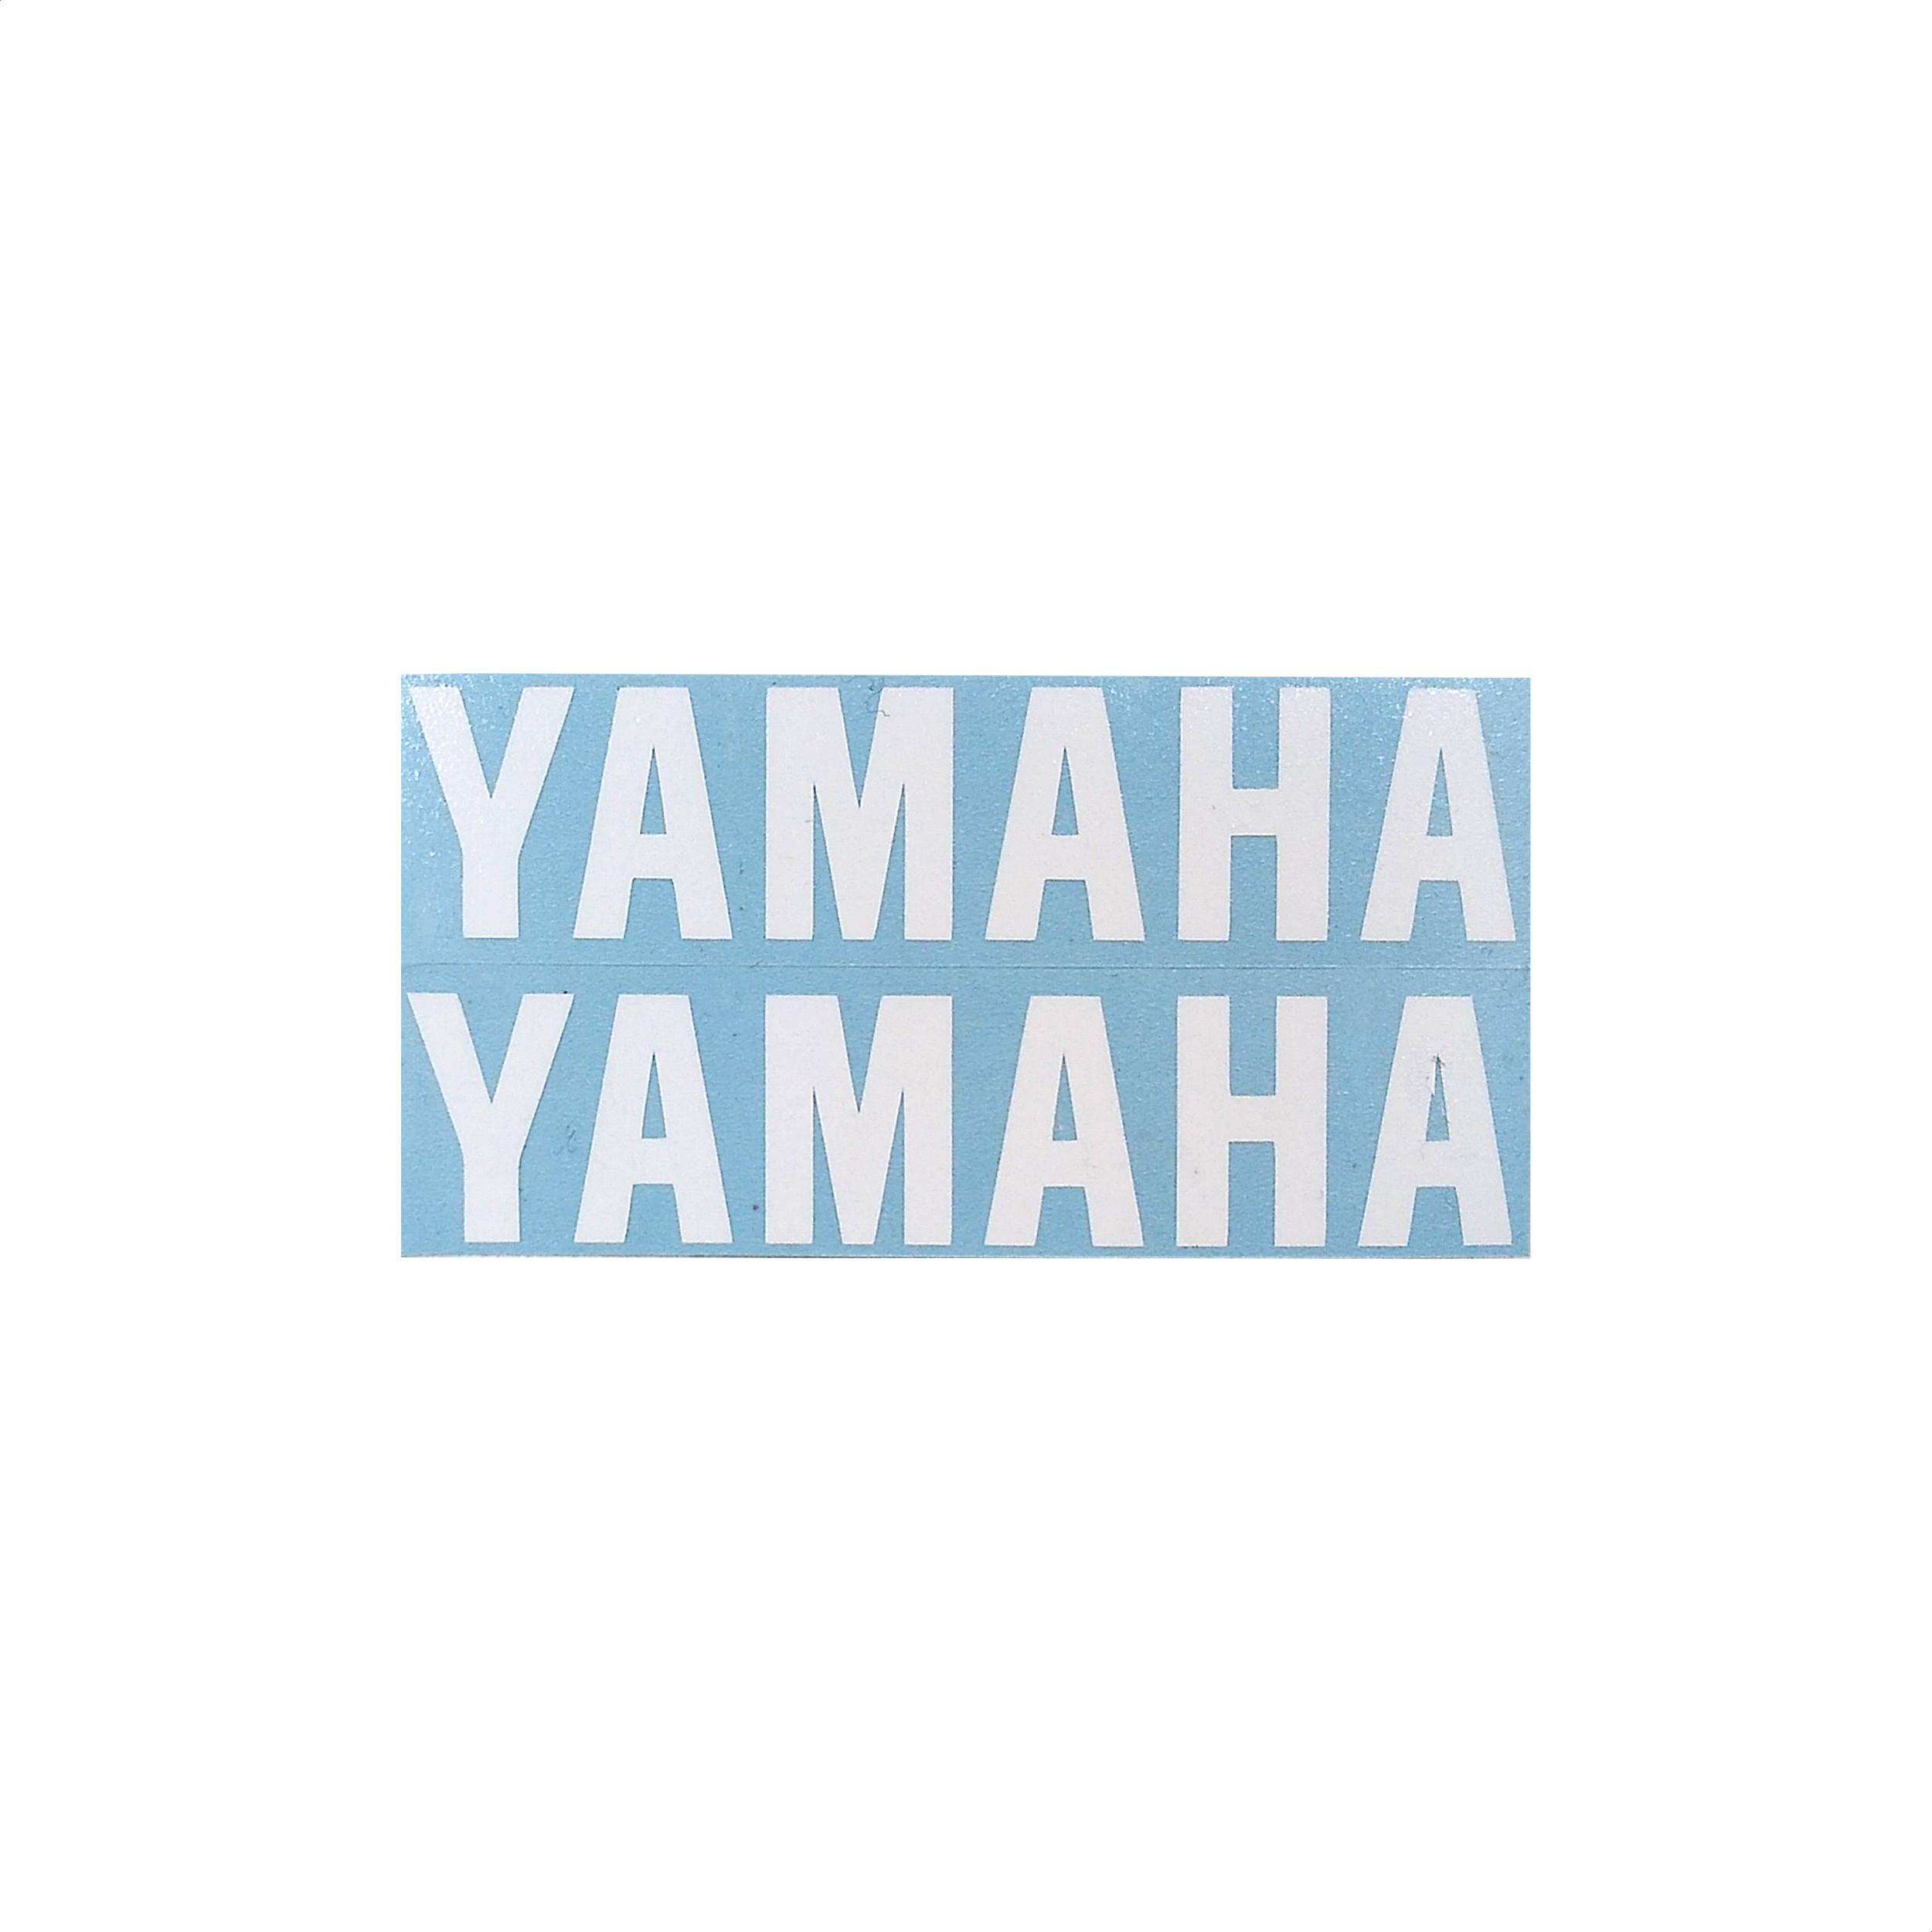 Calco Yamaha blanco GuardabarroS Trasero Delantero X2 Unidades